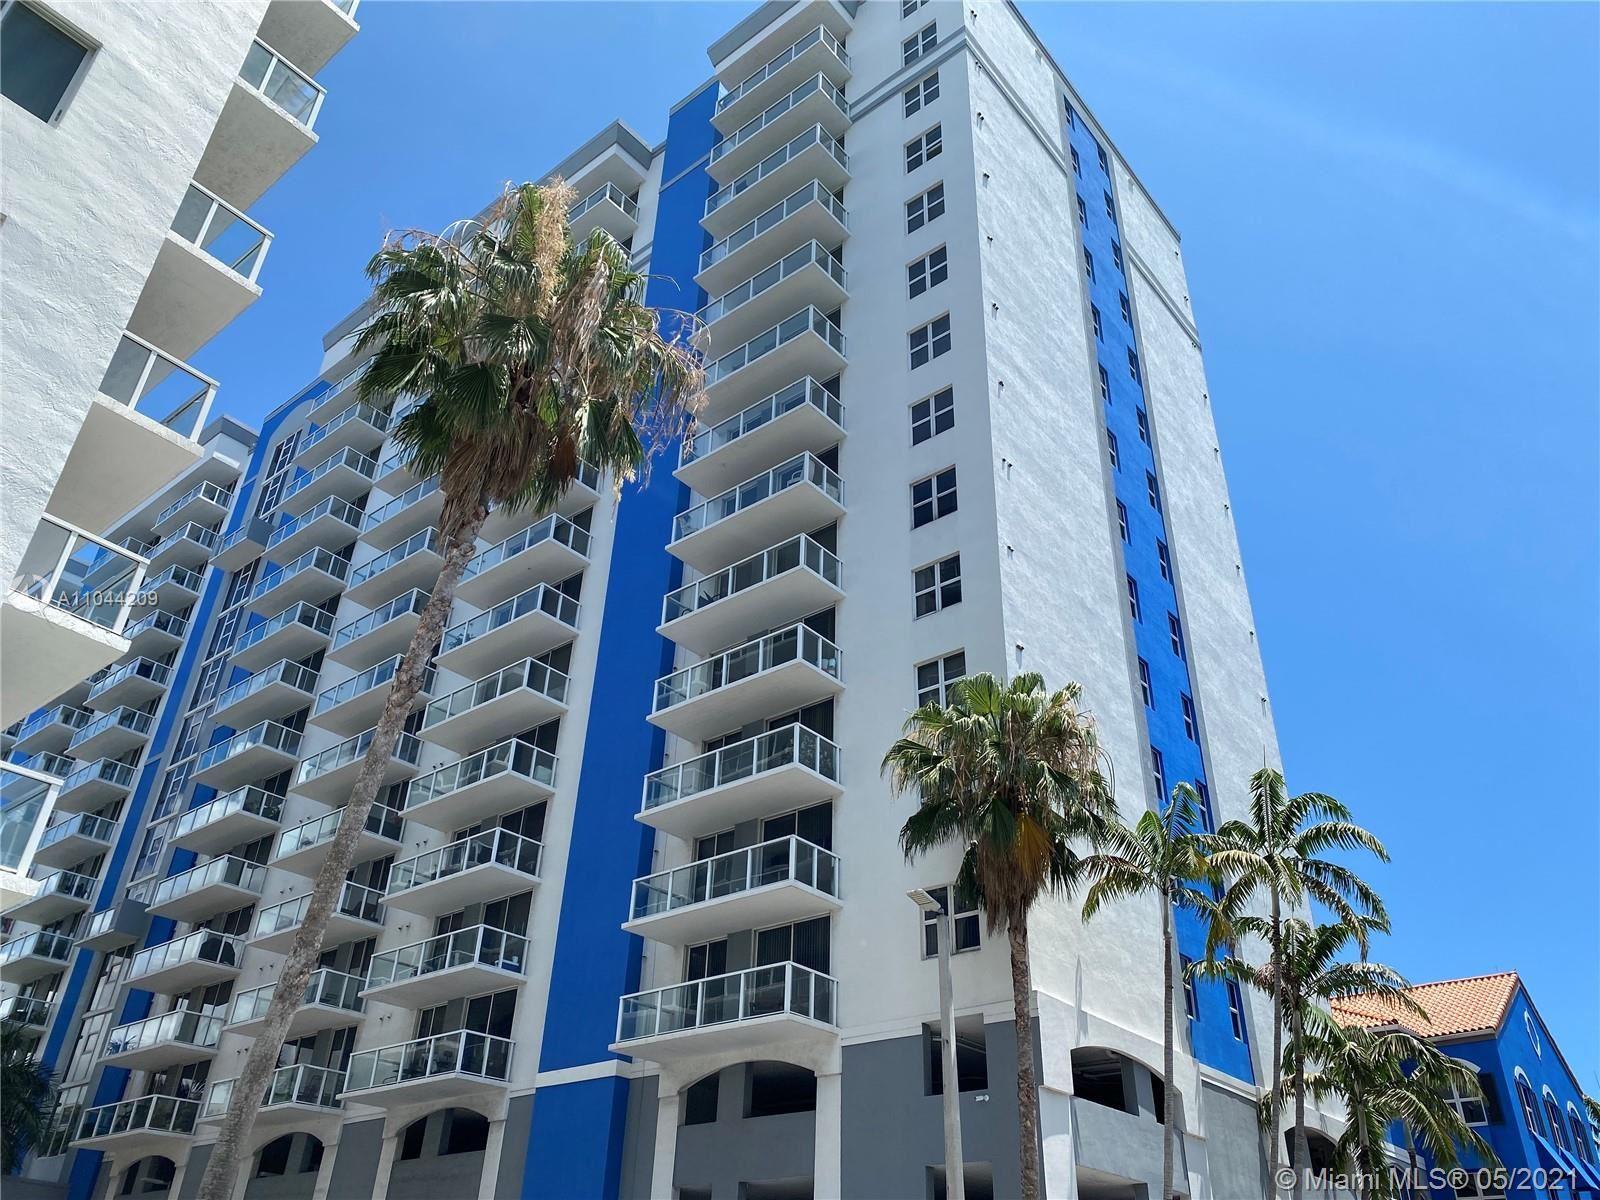 5085 NW 7th St #PH10, Miami, FL 33126 - #: A11044209